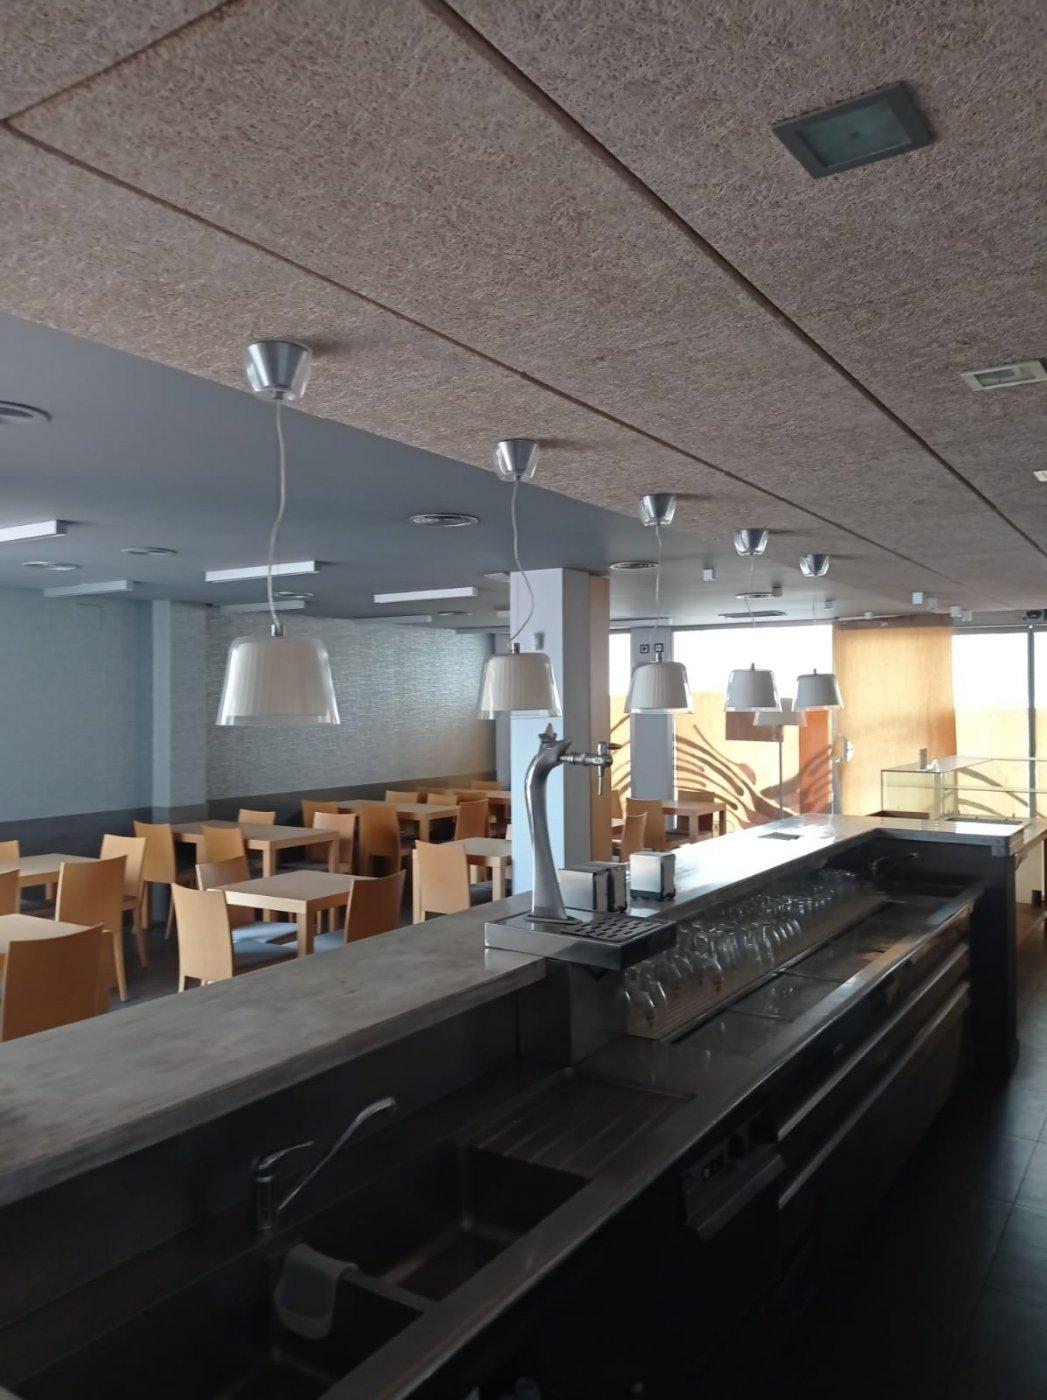 Venta o alquiler con opciÓn a compra de restaurante-bar en el centro de mahÓn totalmente e - imagenInmueble9